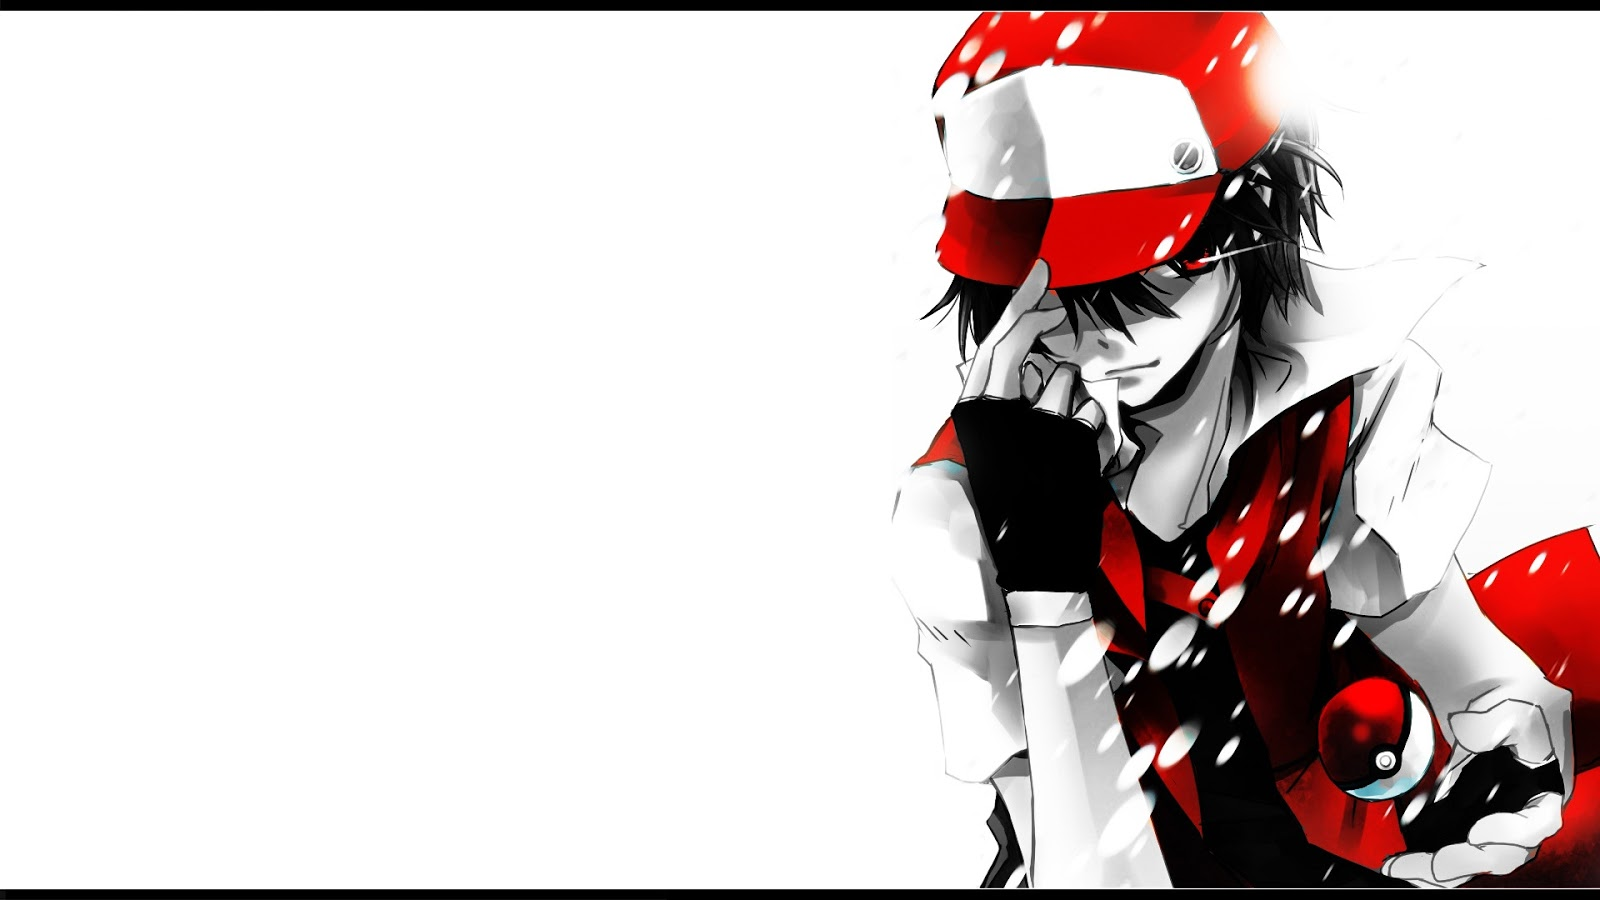 76 ] Hd Anime Backgrounds On WallpaperSafari